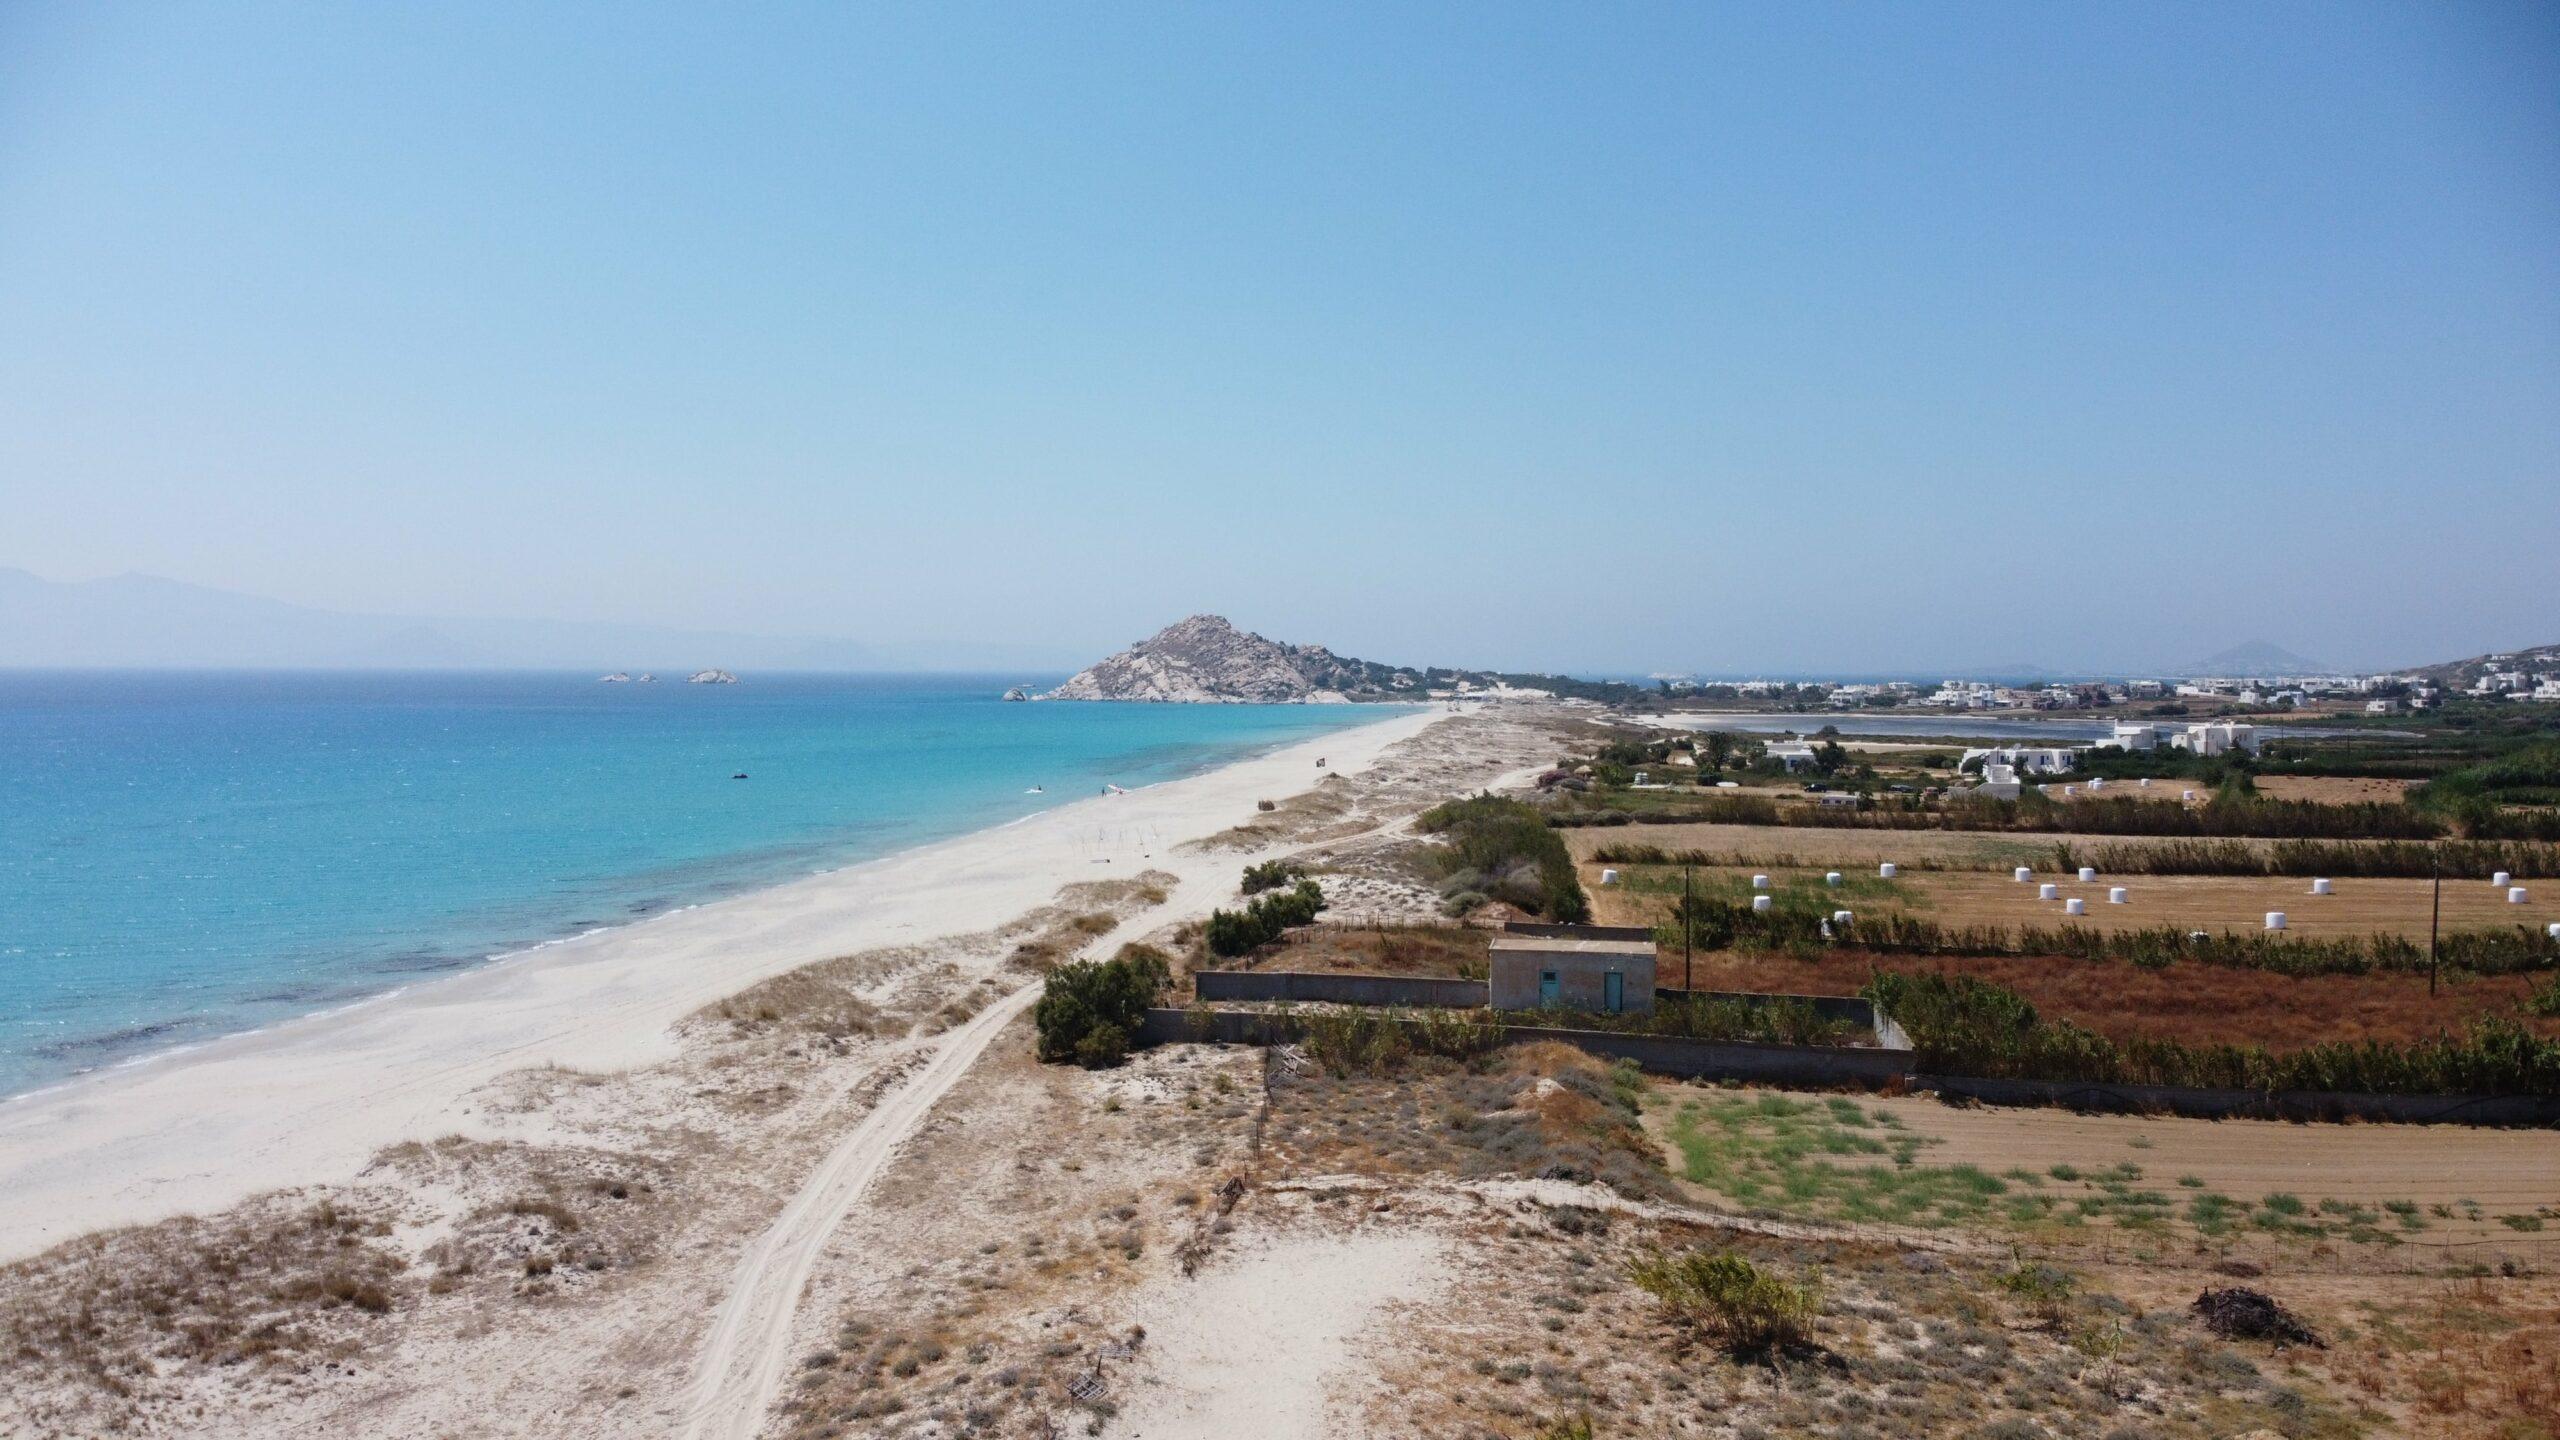 Terrain Naxos  -  ref GR-6159-S (picture 2)